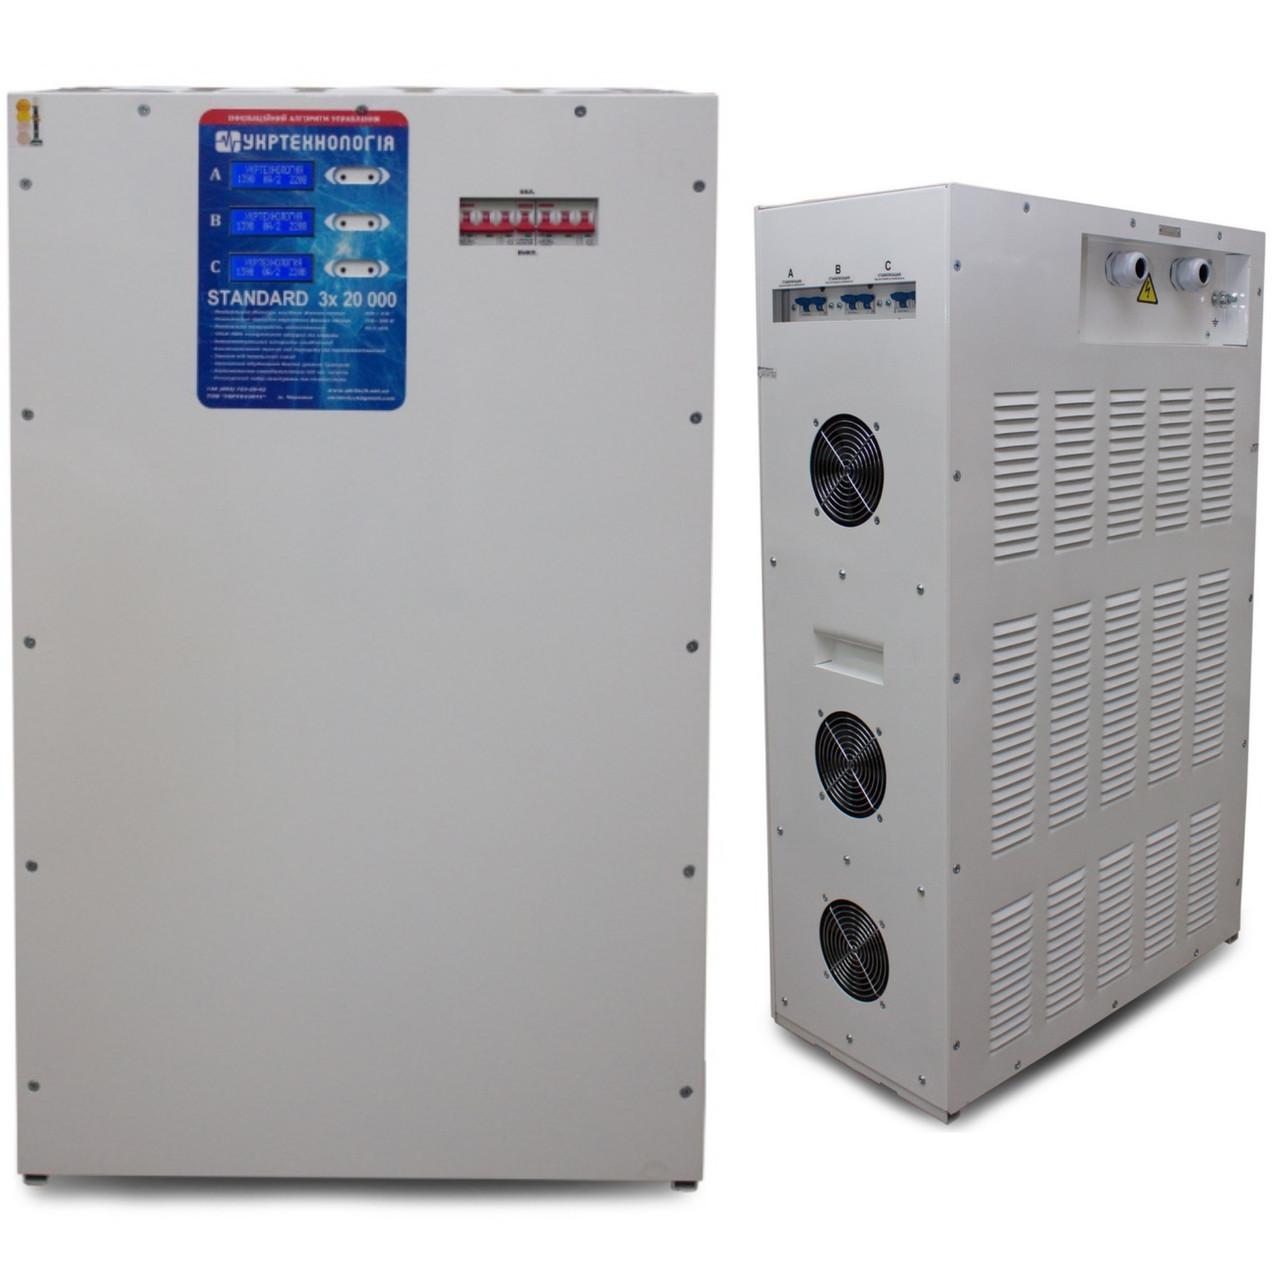 Стабилизатор напряжения Укртехнология HCH 3x9000 Optimum HV 27,5 кВт